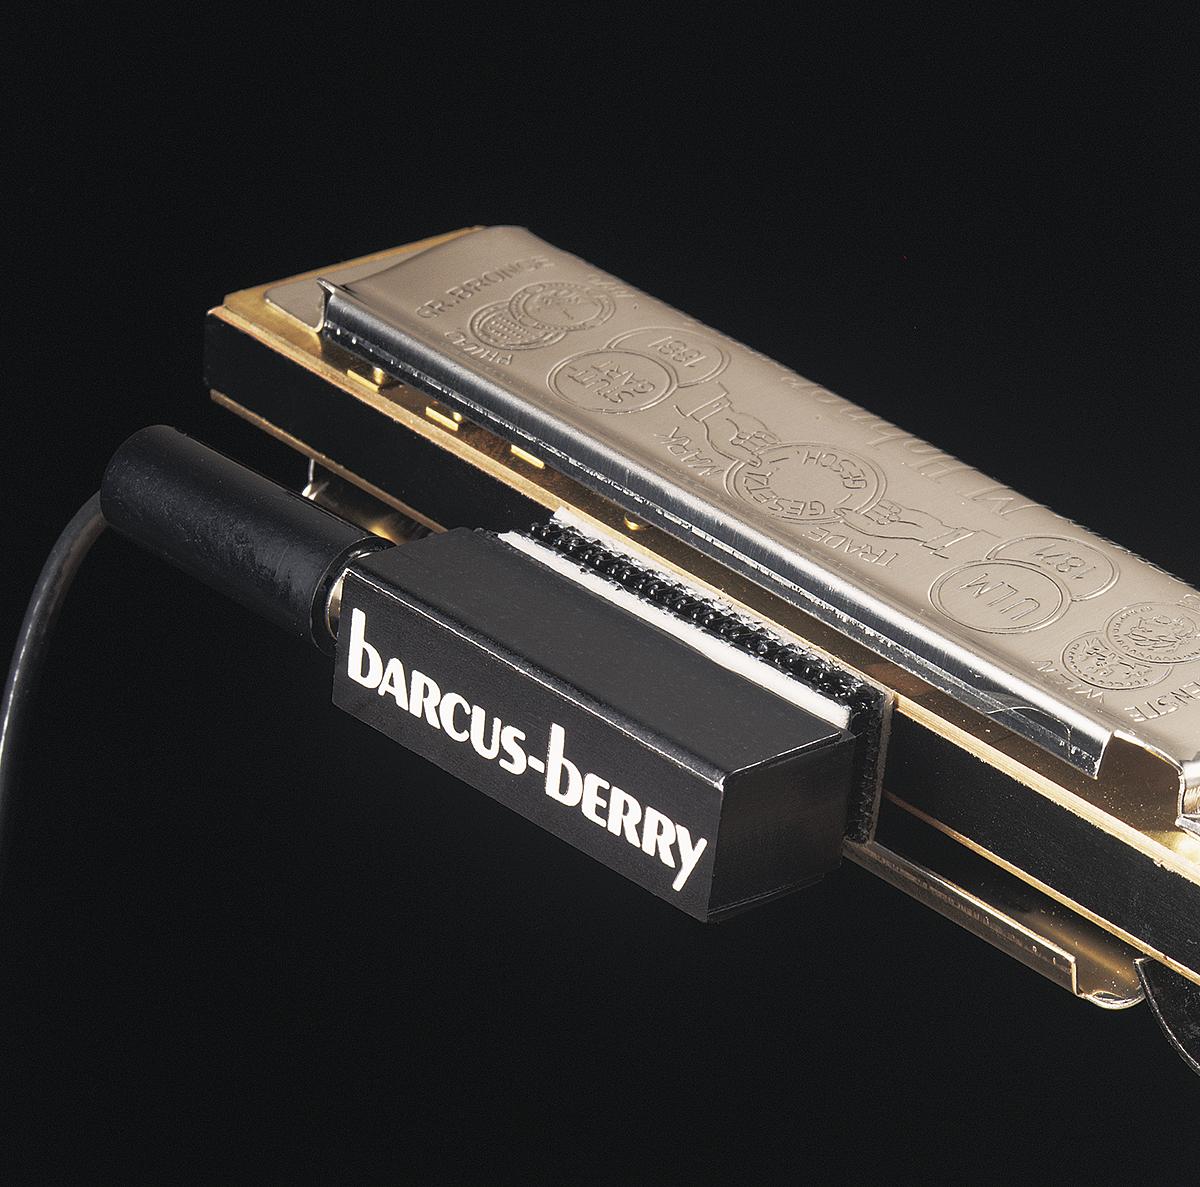 Barcus berry electret harmonica mic